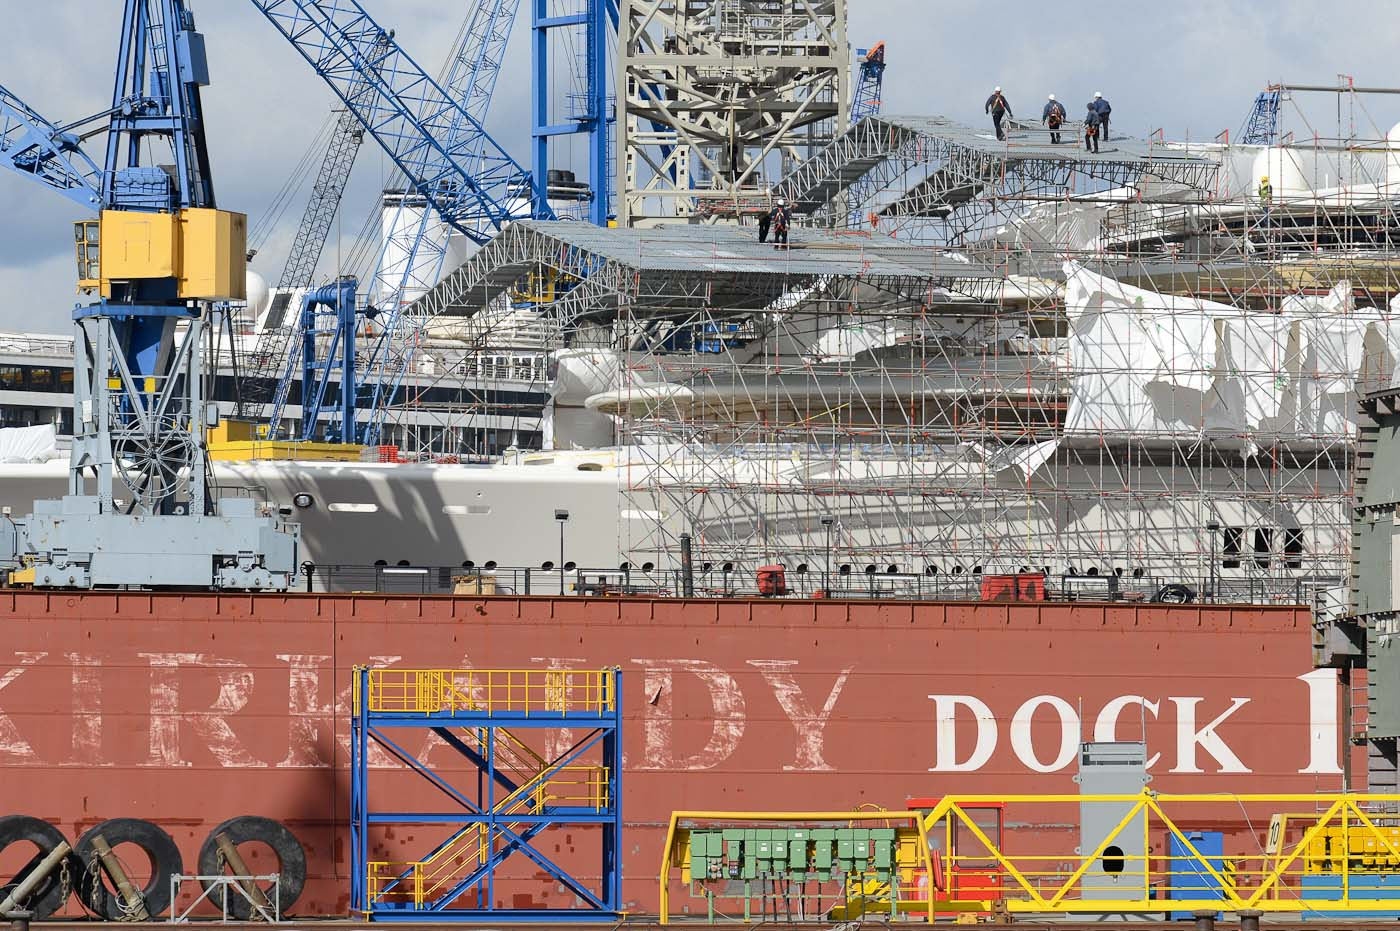 Foto ID 2015041710 Traditionswerft Blohm + Voss, Hafen Hamburg